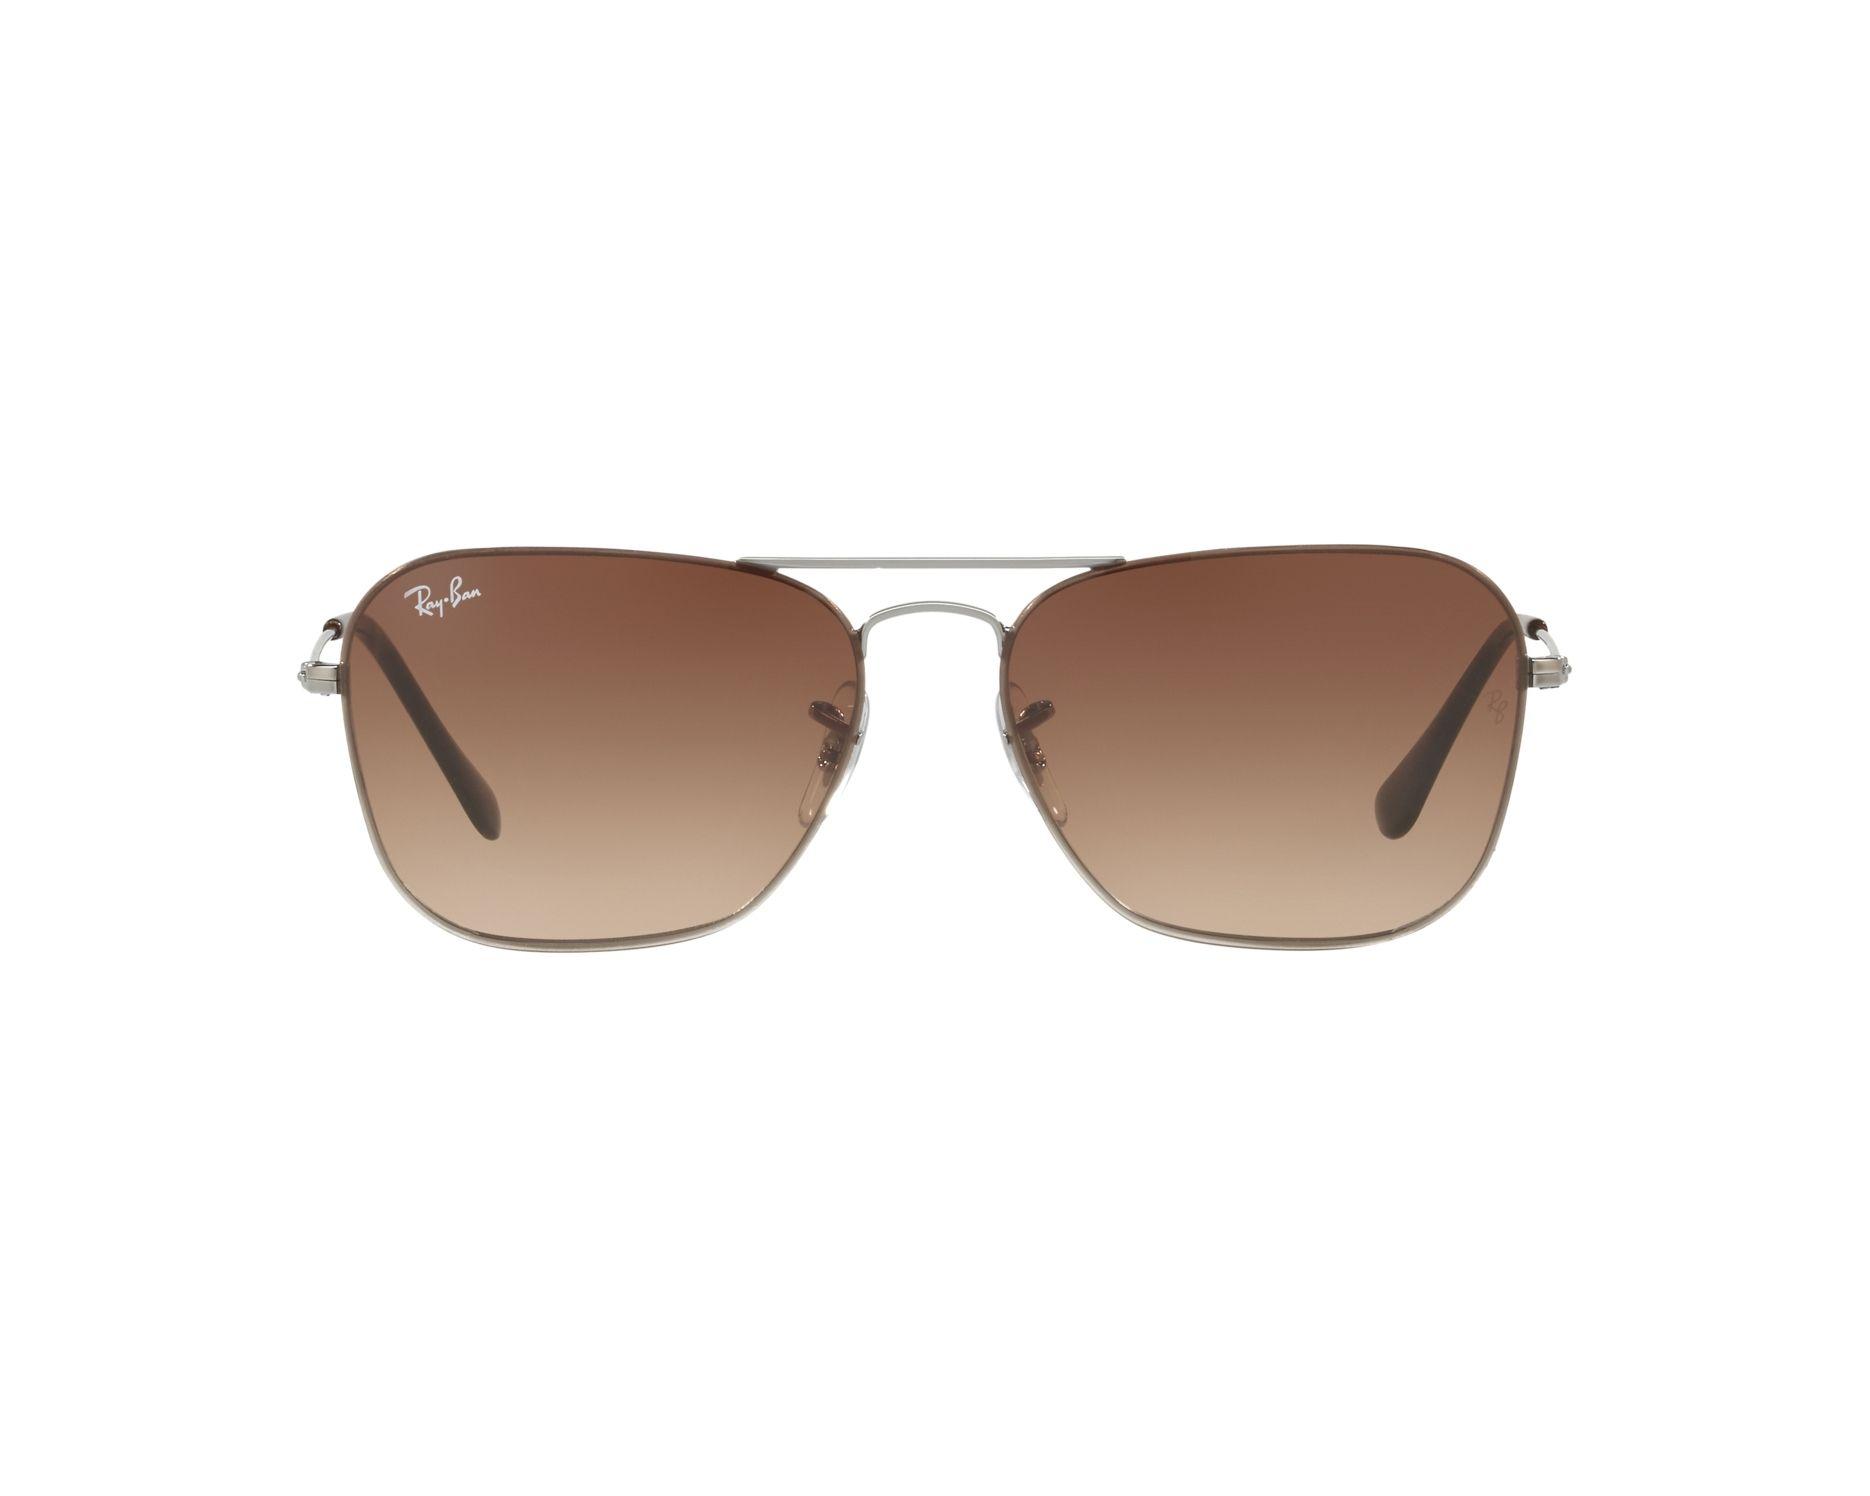 32bfeb0755 Sunglasses Ray-Ban RB-3603 004 13 56-14 Gun 360 degree